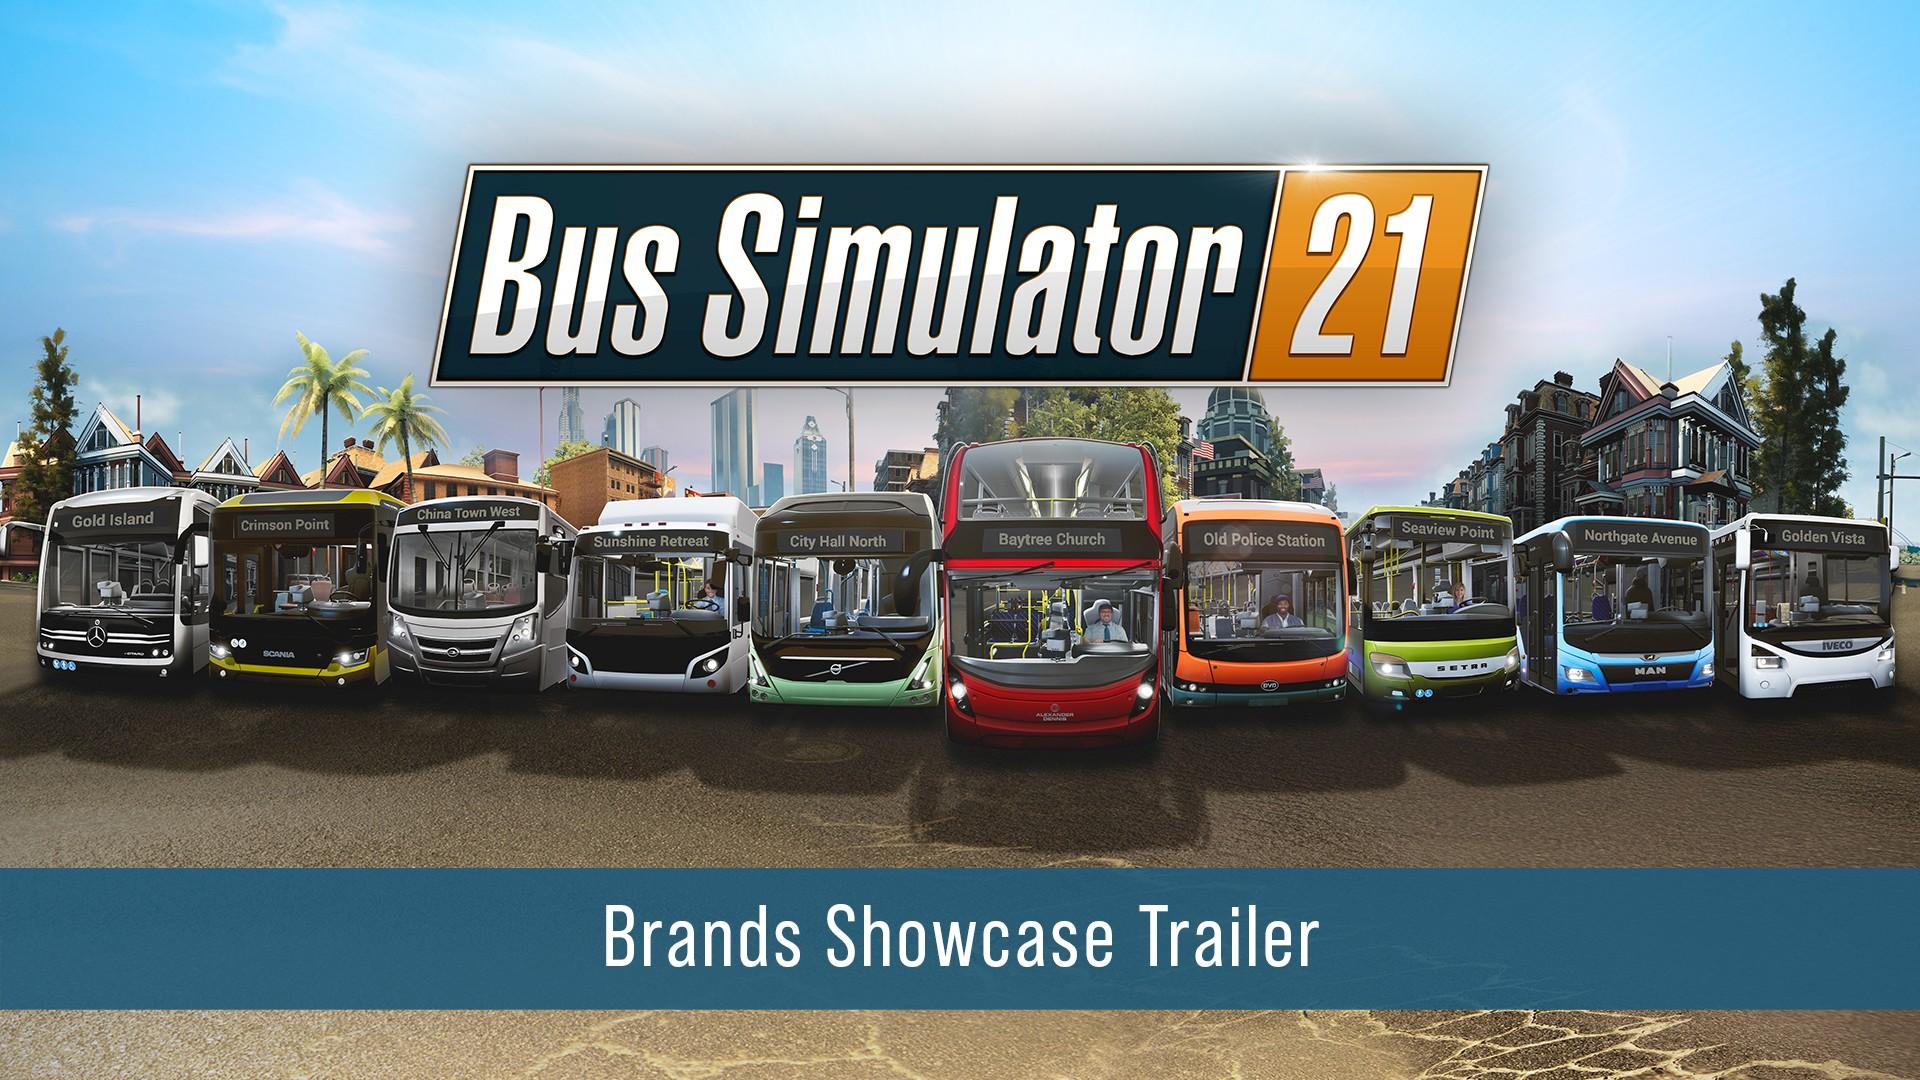 Video For Brand Family in Bus Simulator 21 Revealed